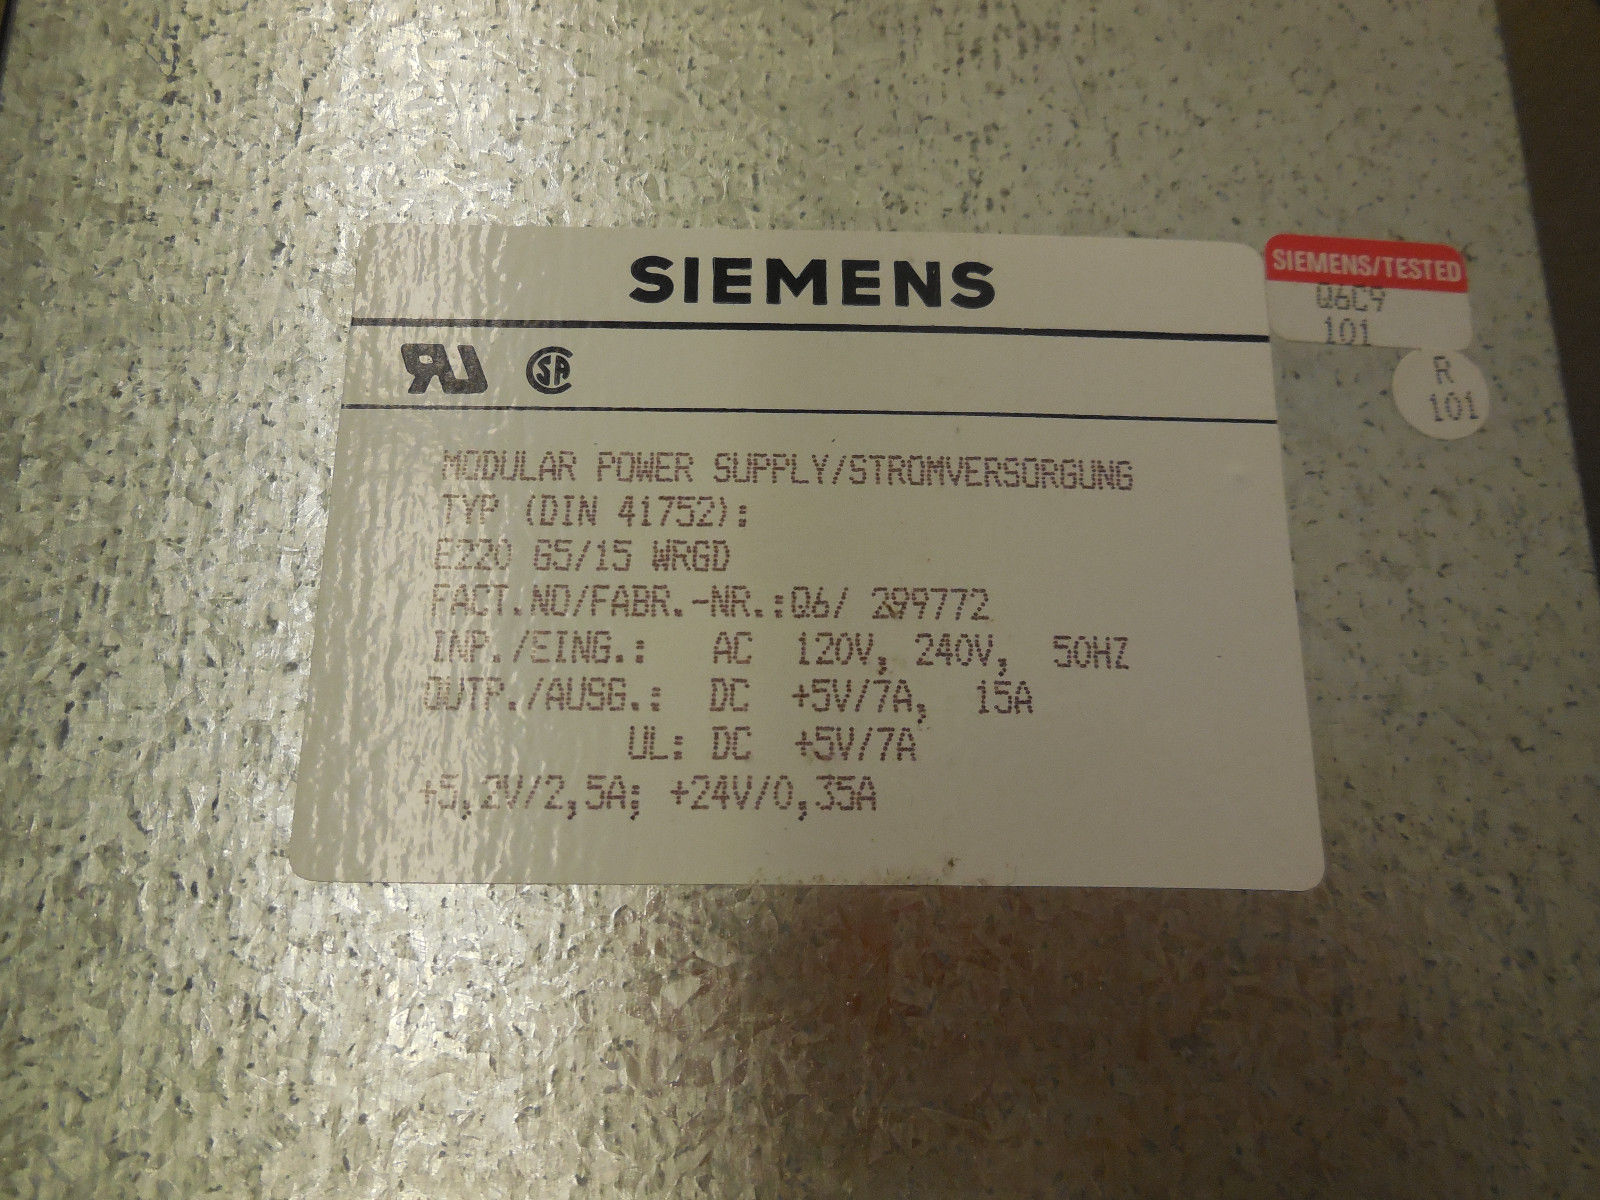 SIEMENS MODULAR POWER SUPPLY DIN 41752